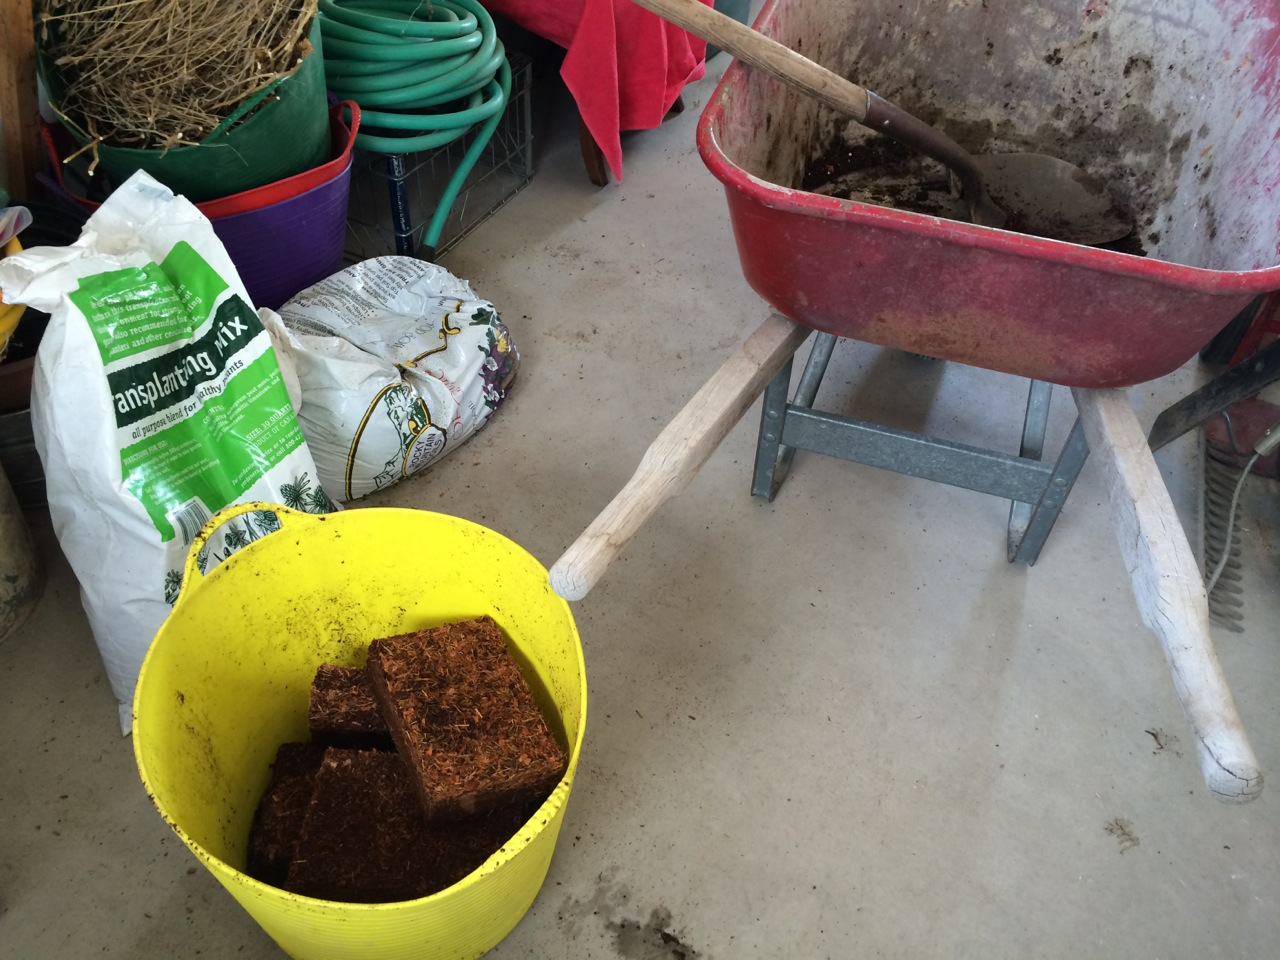 Coir bricks soaking up warm water in a garden trug next to the wheelbarrow in my shop.